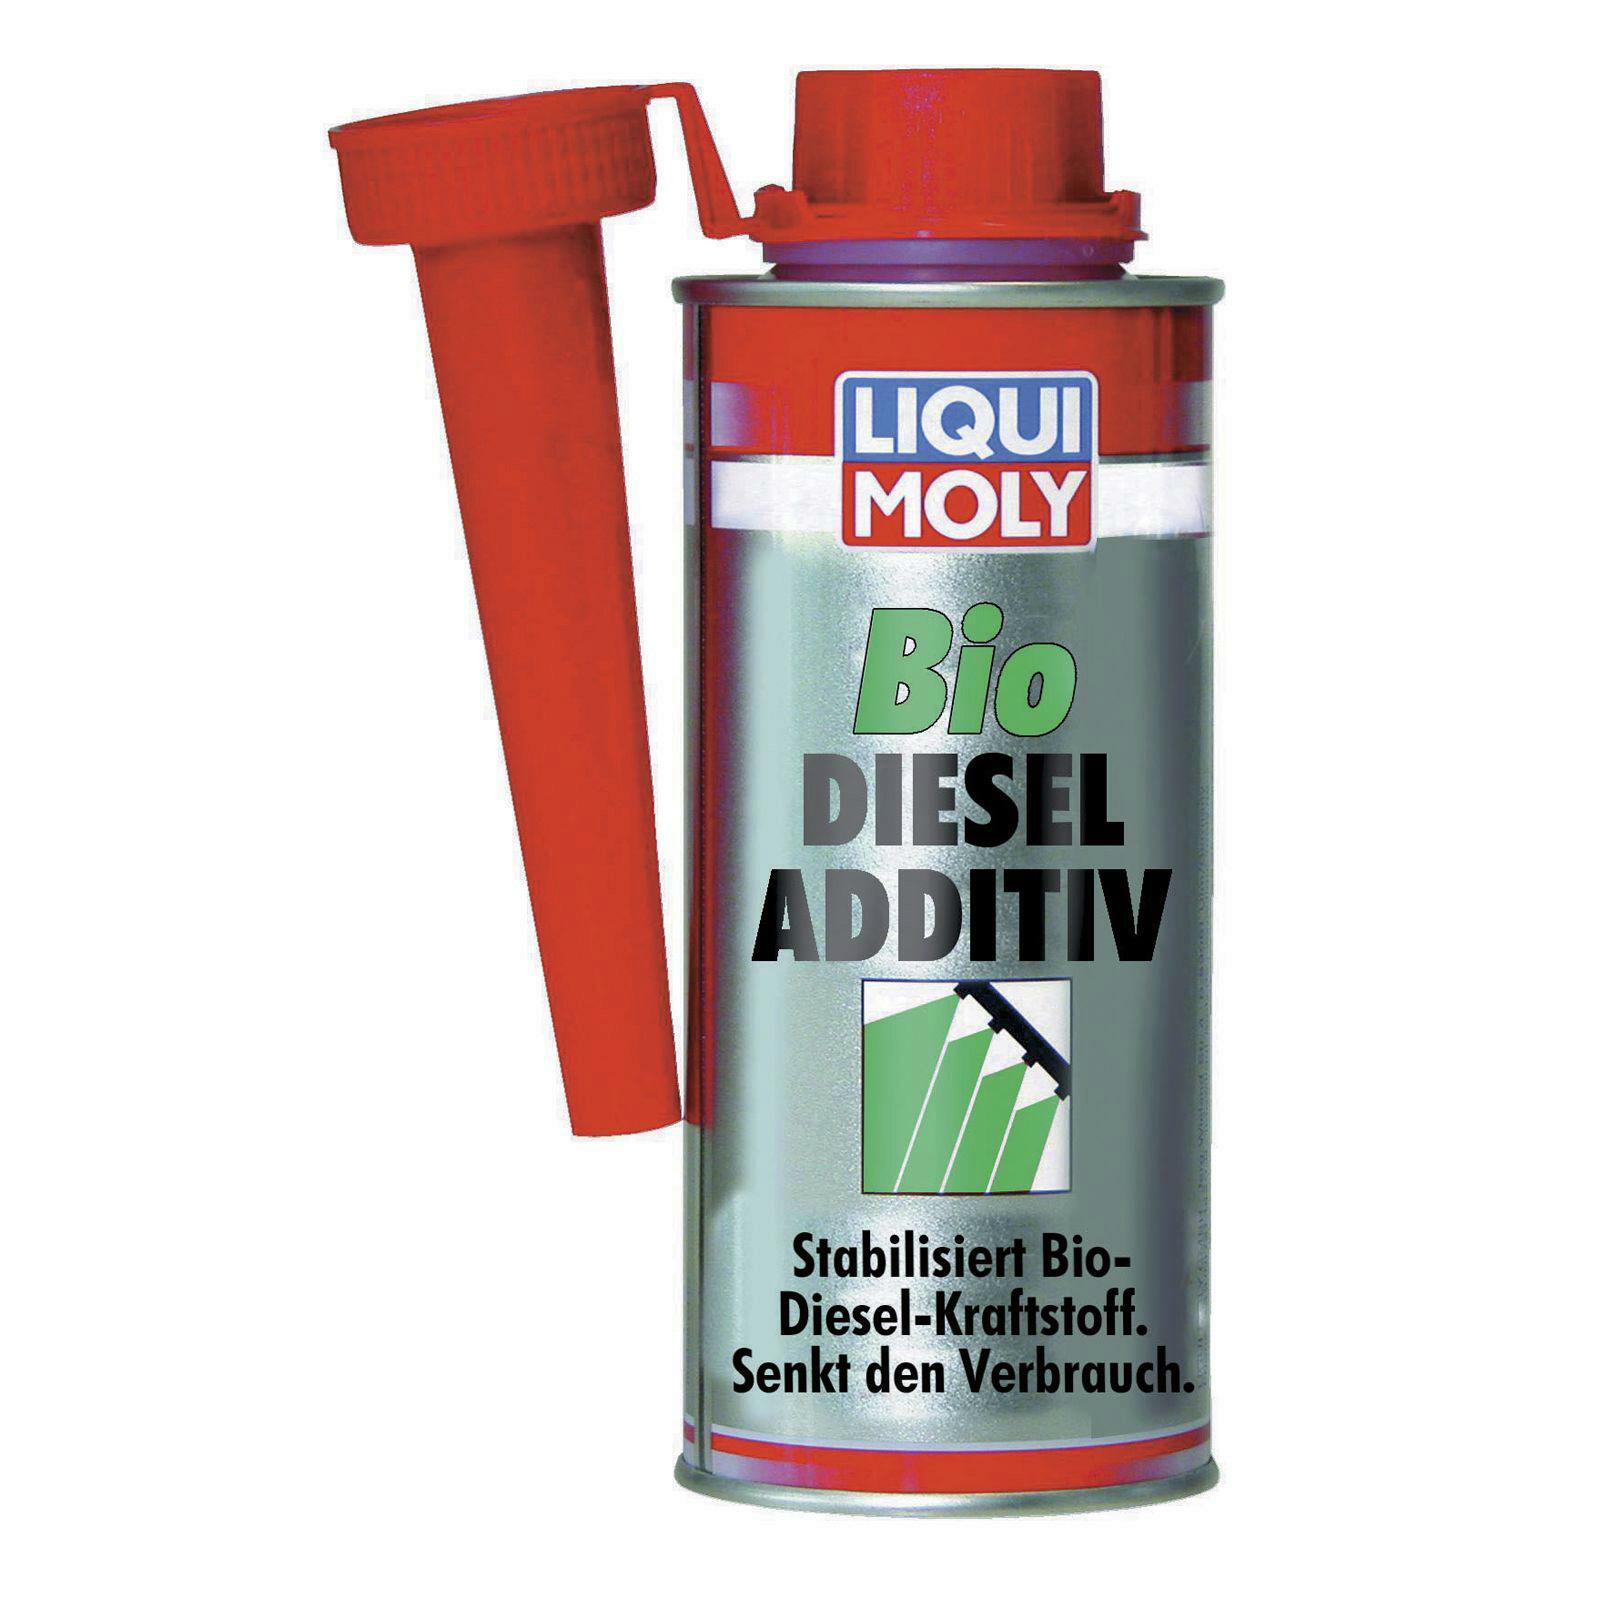 liqui moly pro line super diesel additiv 1l lott autoteile. Black Bedroom Furniture Sets. Home Design Ideas